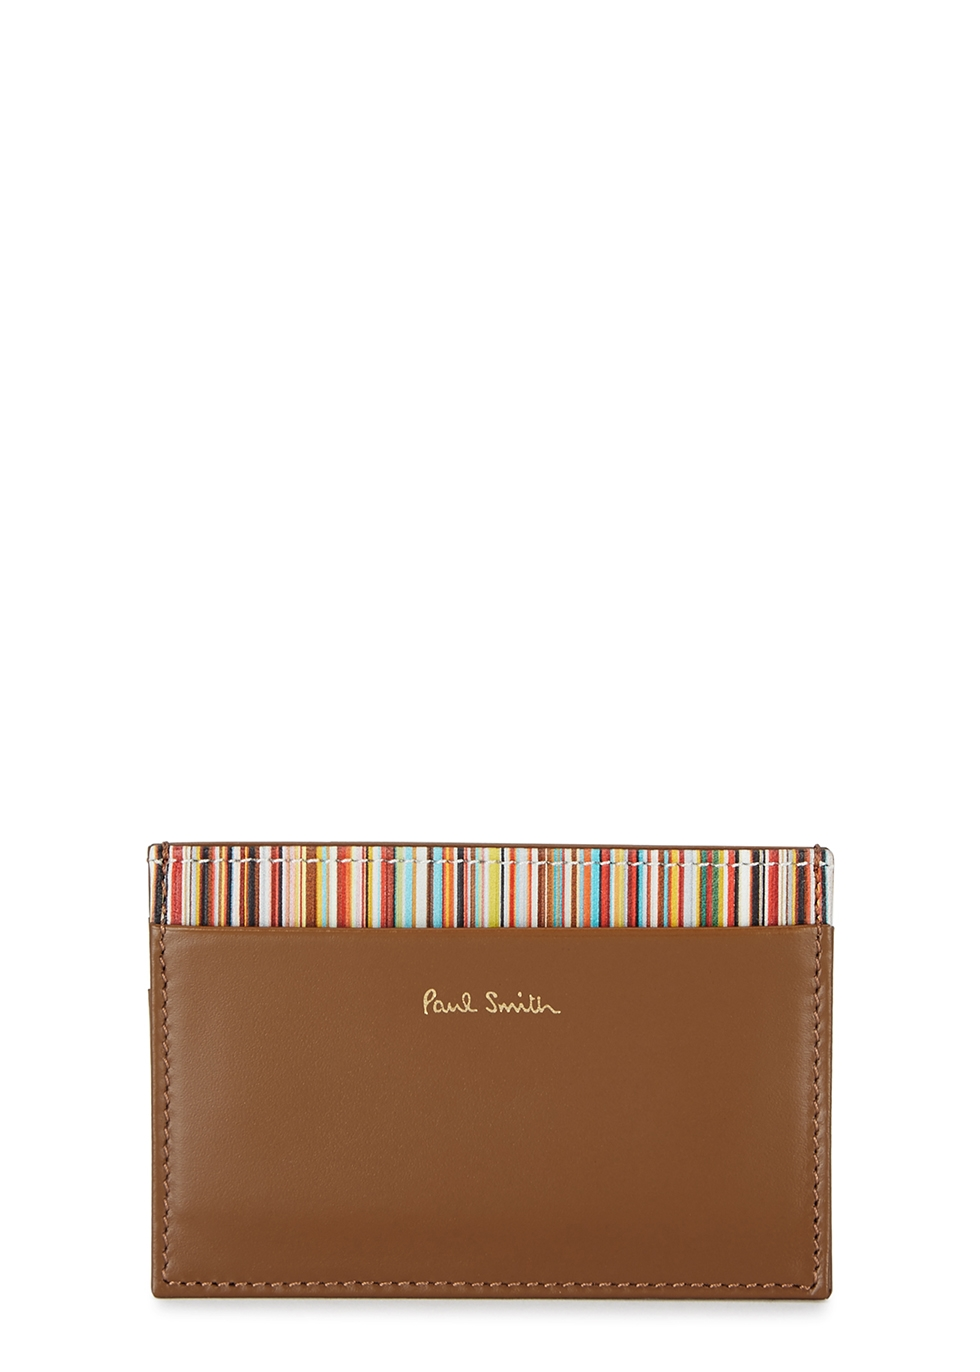 d6d2fca3e9f Designer Card Holders - Small Leathers - Harvey Nichols